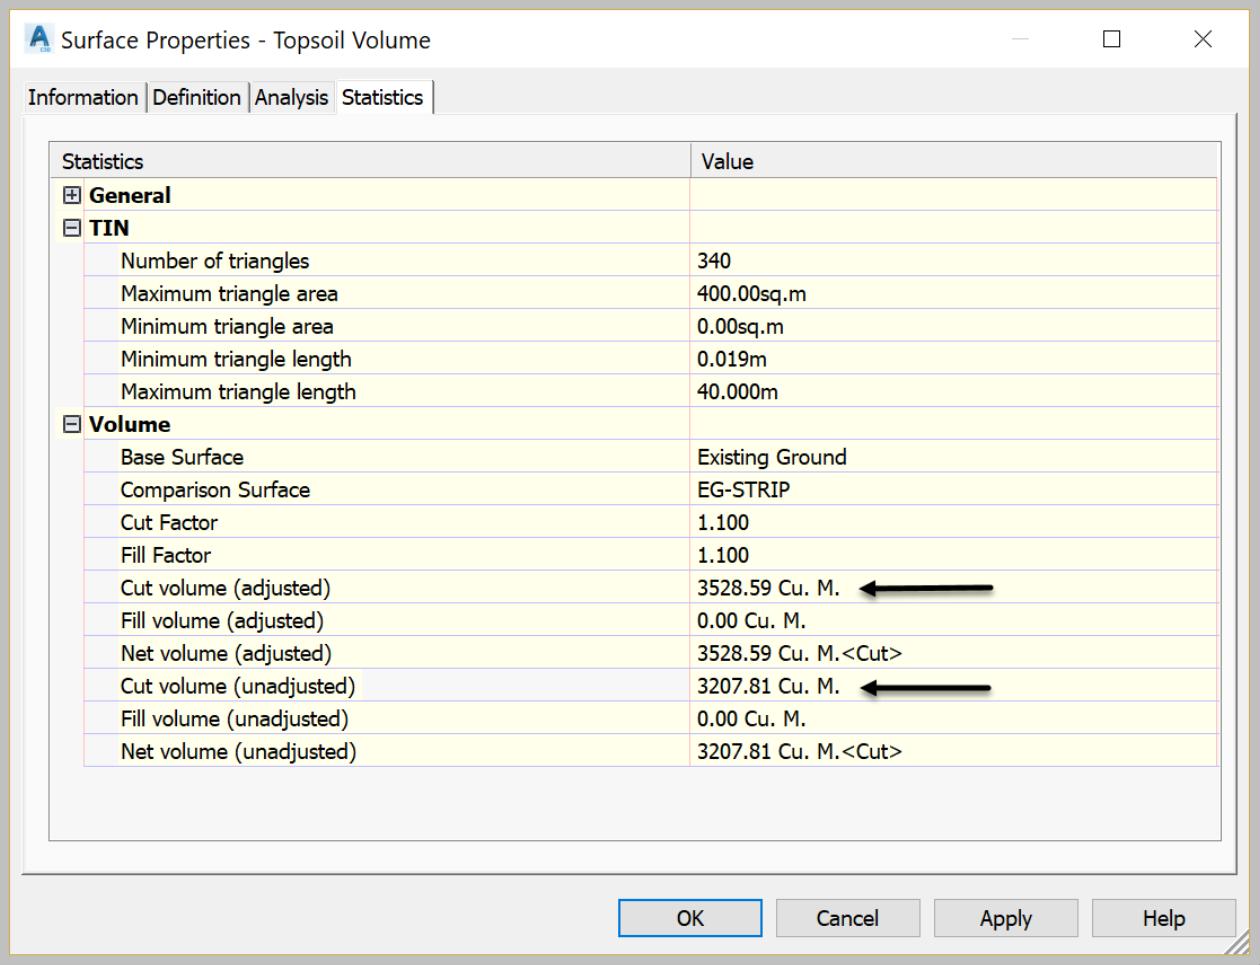 C:\Users\Infratech.Civil\AppData\Local\Microsoft\Windows\INetCache\Content.MSO\4A8728E3.tmp